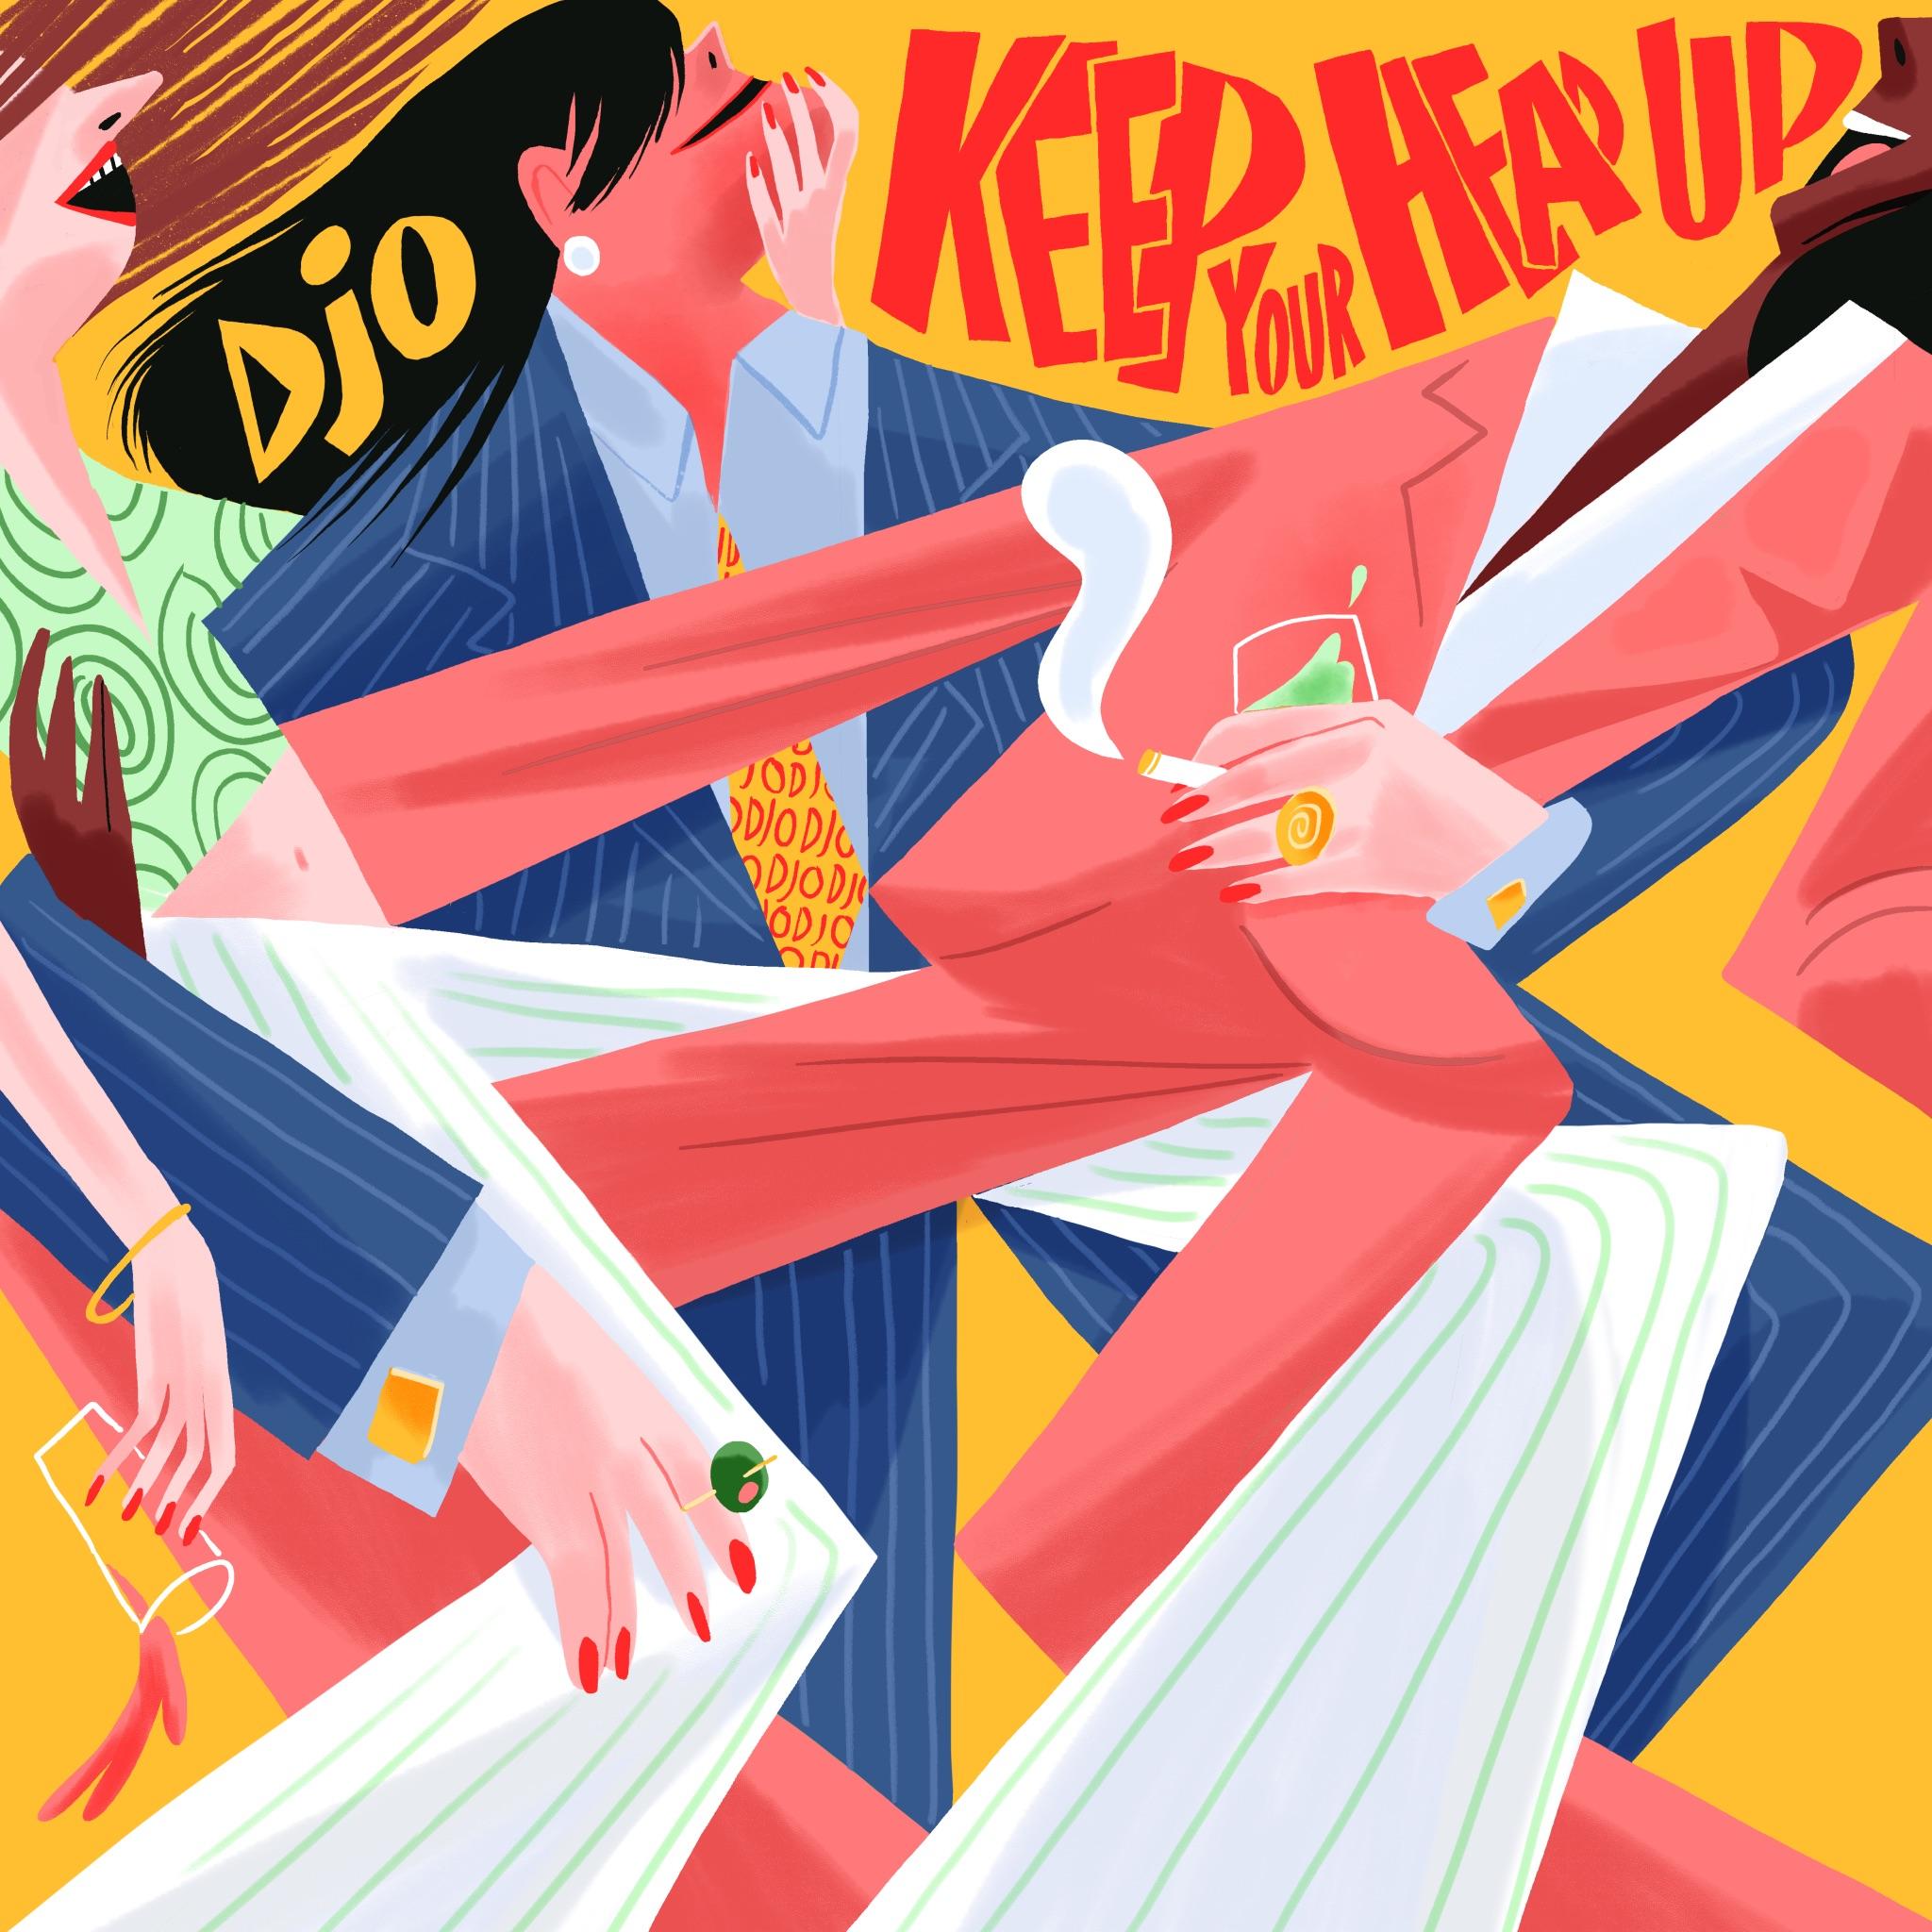 joe keery Djo - _Keep Your Head Up_ Single Artwork